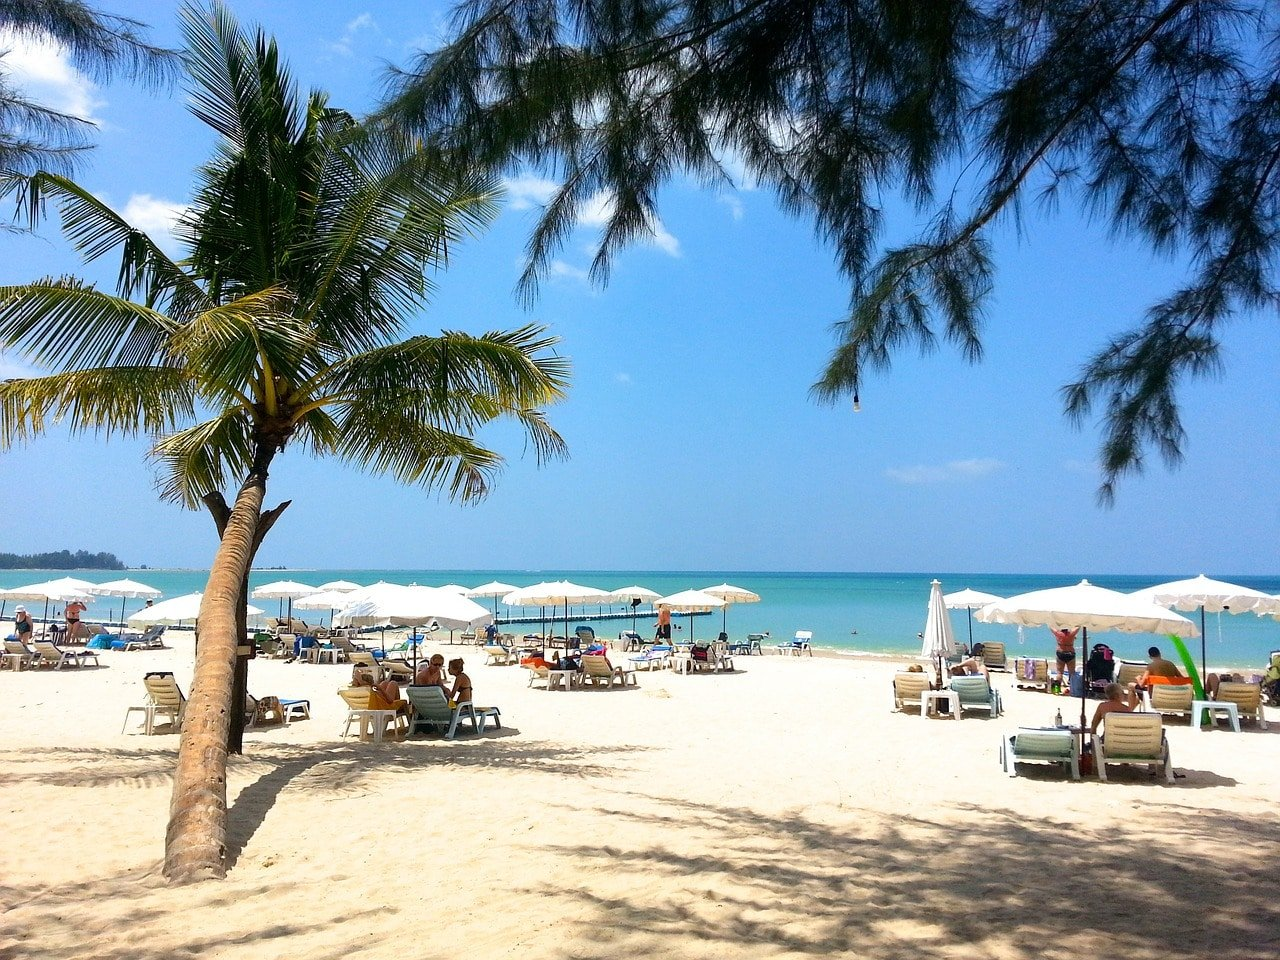 Phuket: Tornano sdraio ed ombrelloni